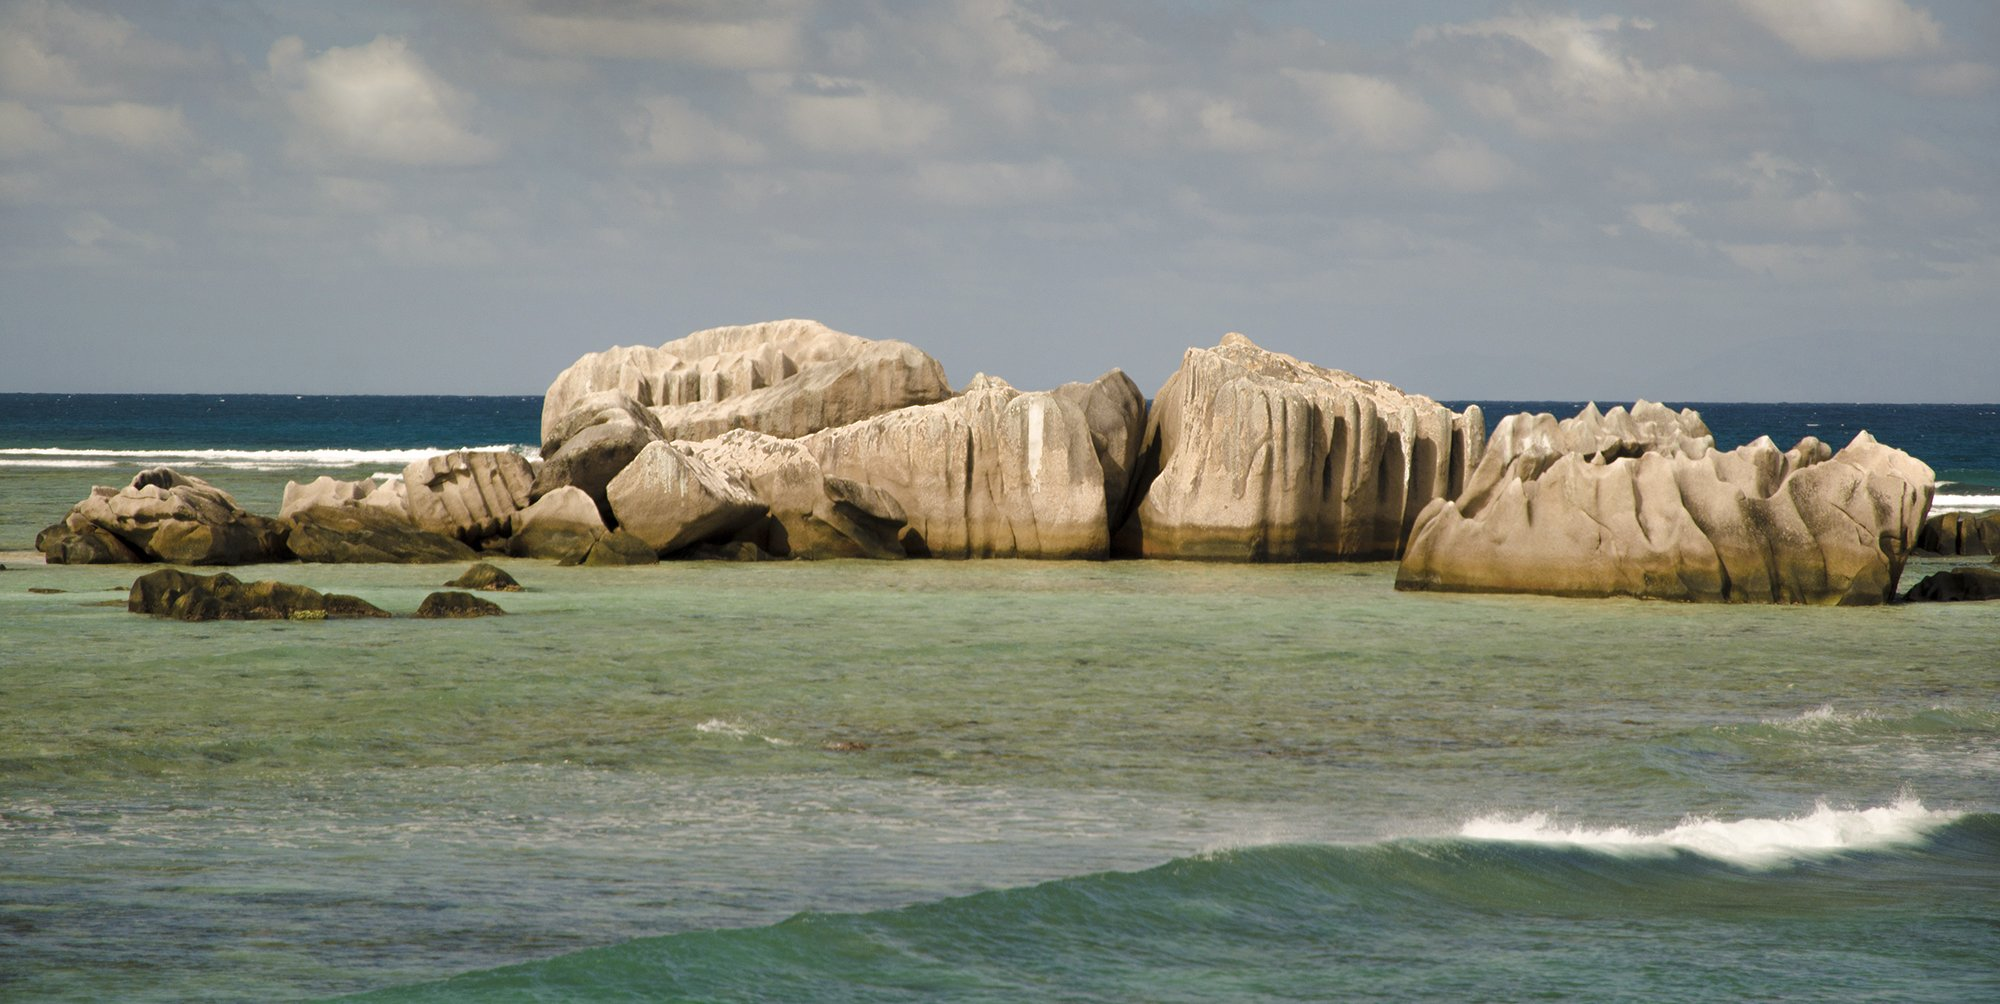 Камни, скалы, отров, океан, берег, экзотика, тропики, Марина Мудрова